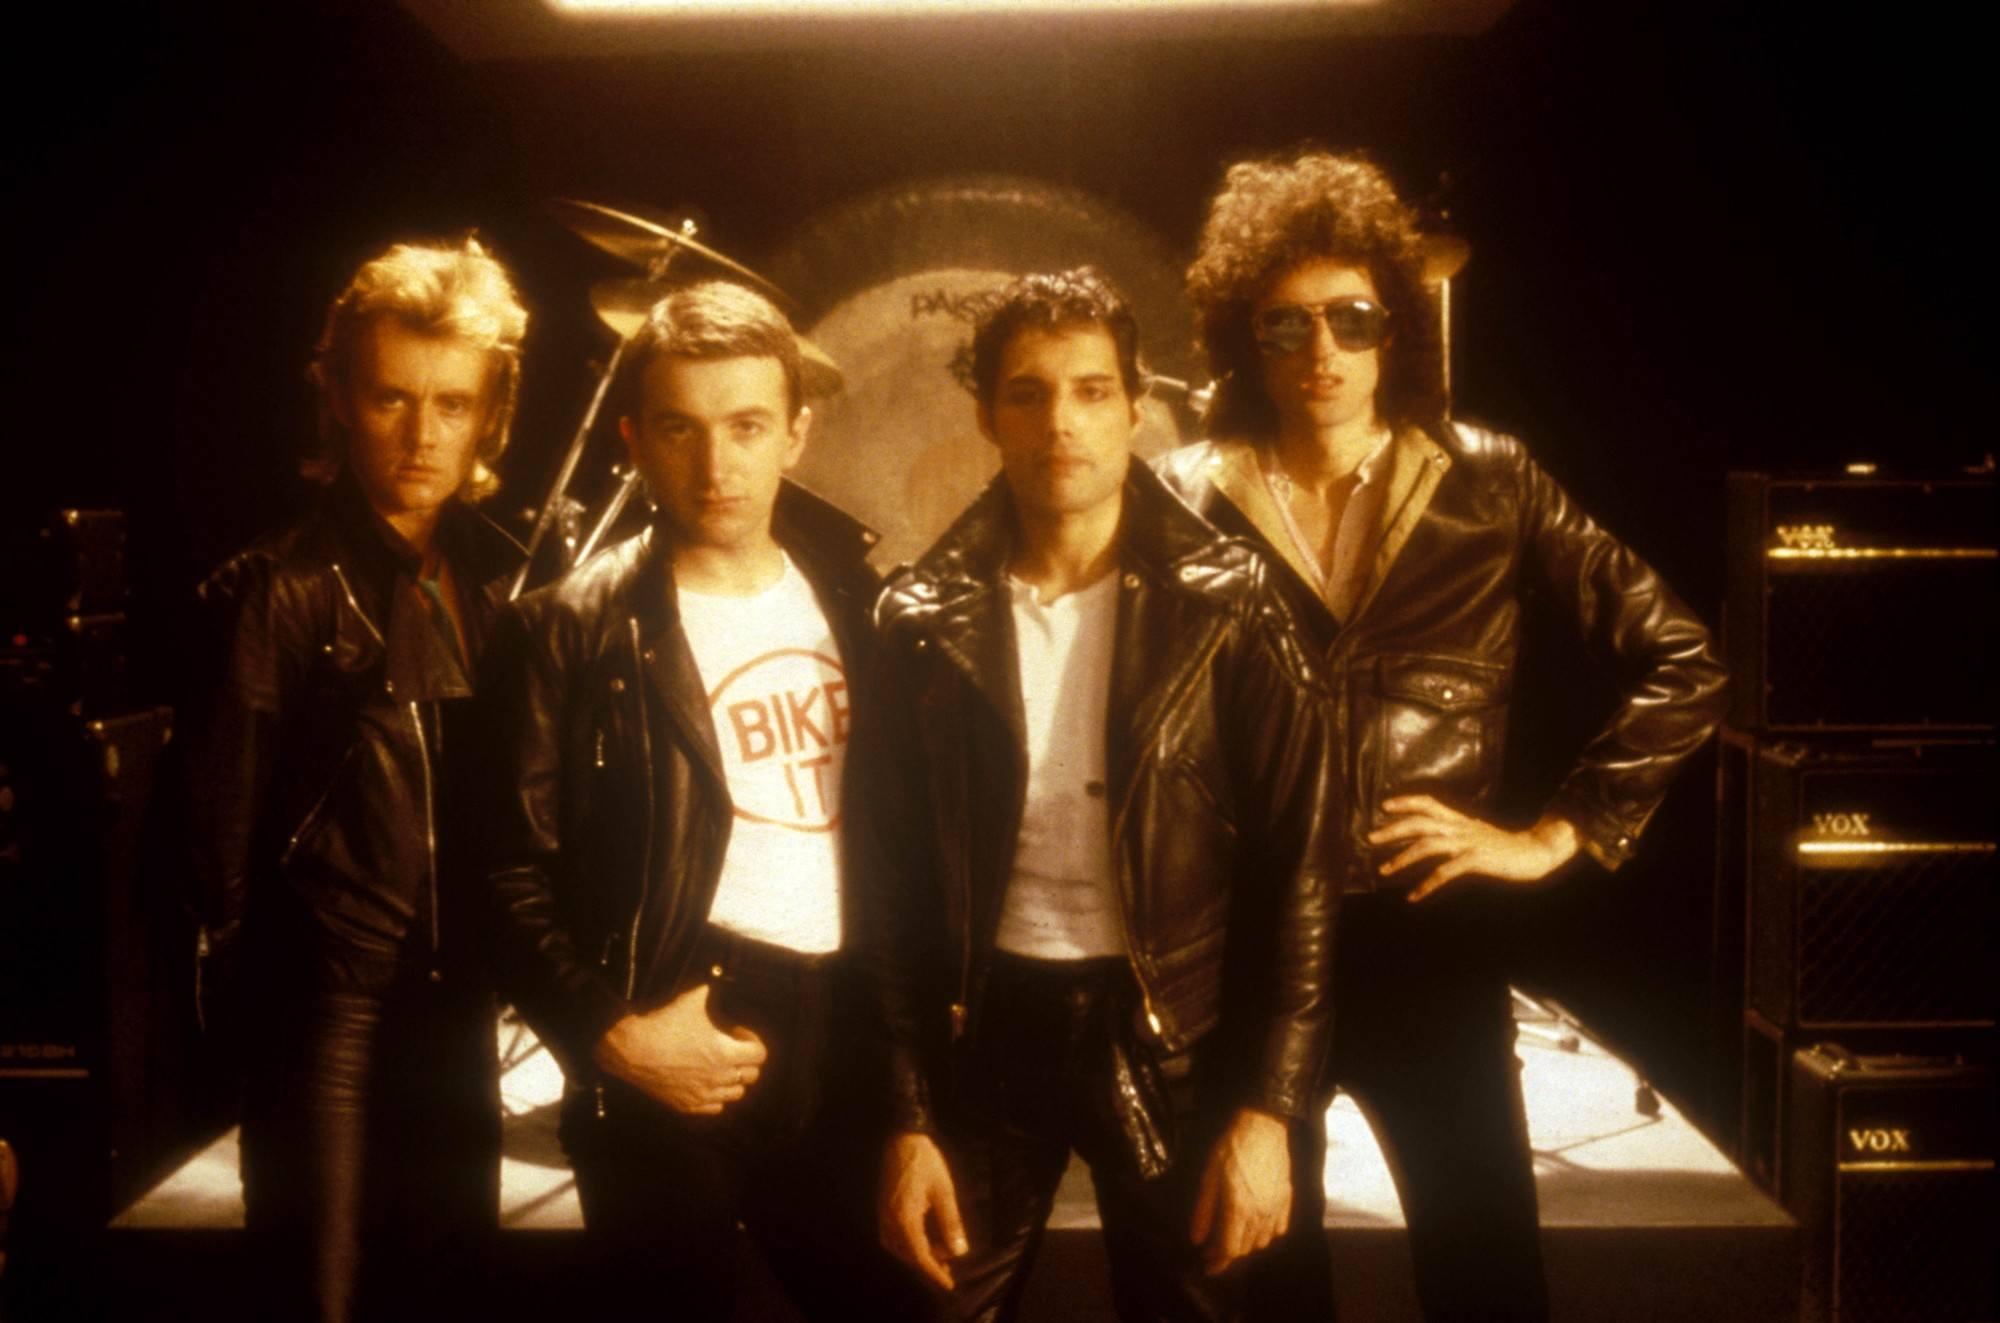 1 ZrKheRQJF8aTnLRrbrj51g 30 Things You Didn't Know About Freddie Mercury